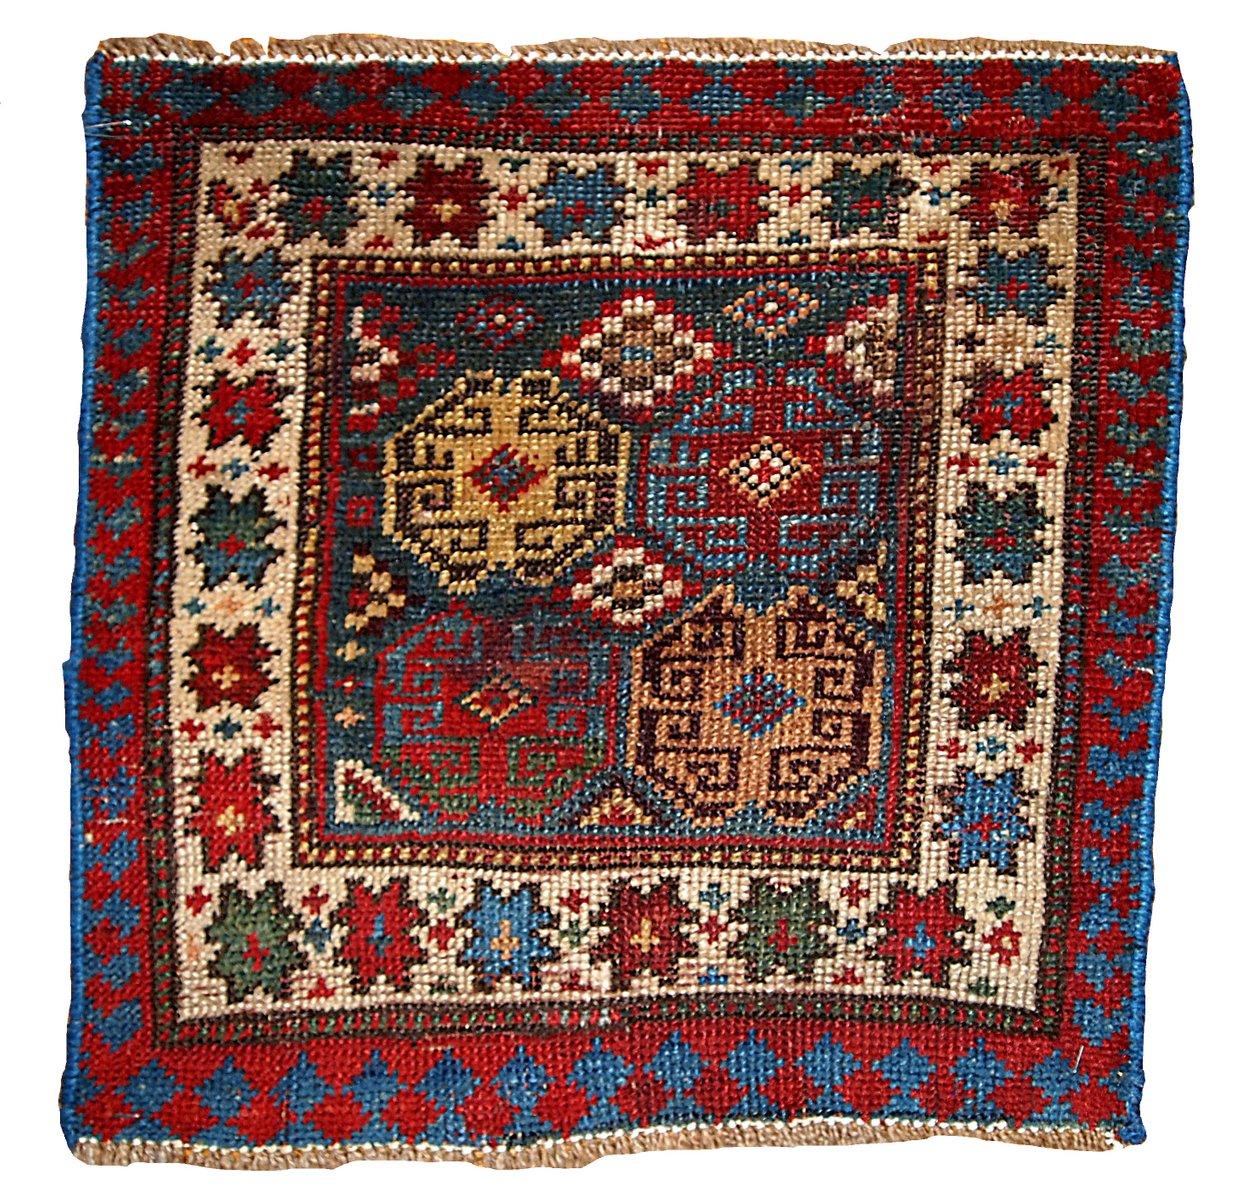 Russische Teppiche antiker handgemachter russischer bagface teppich 1880er bei pamono